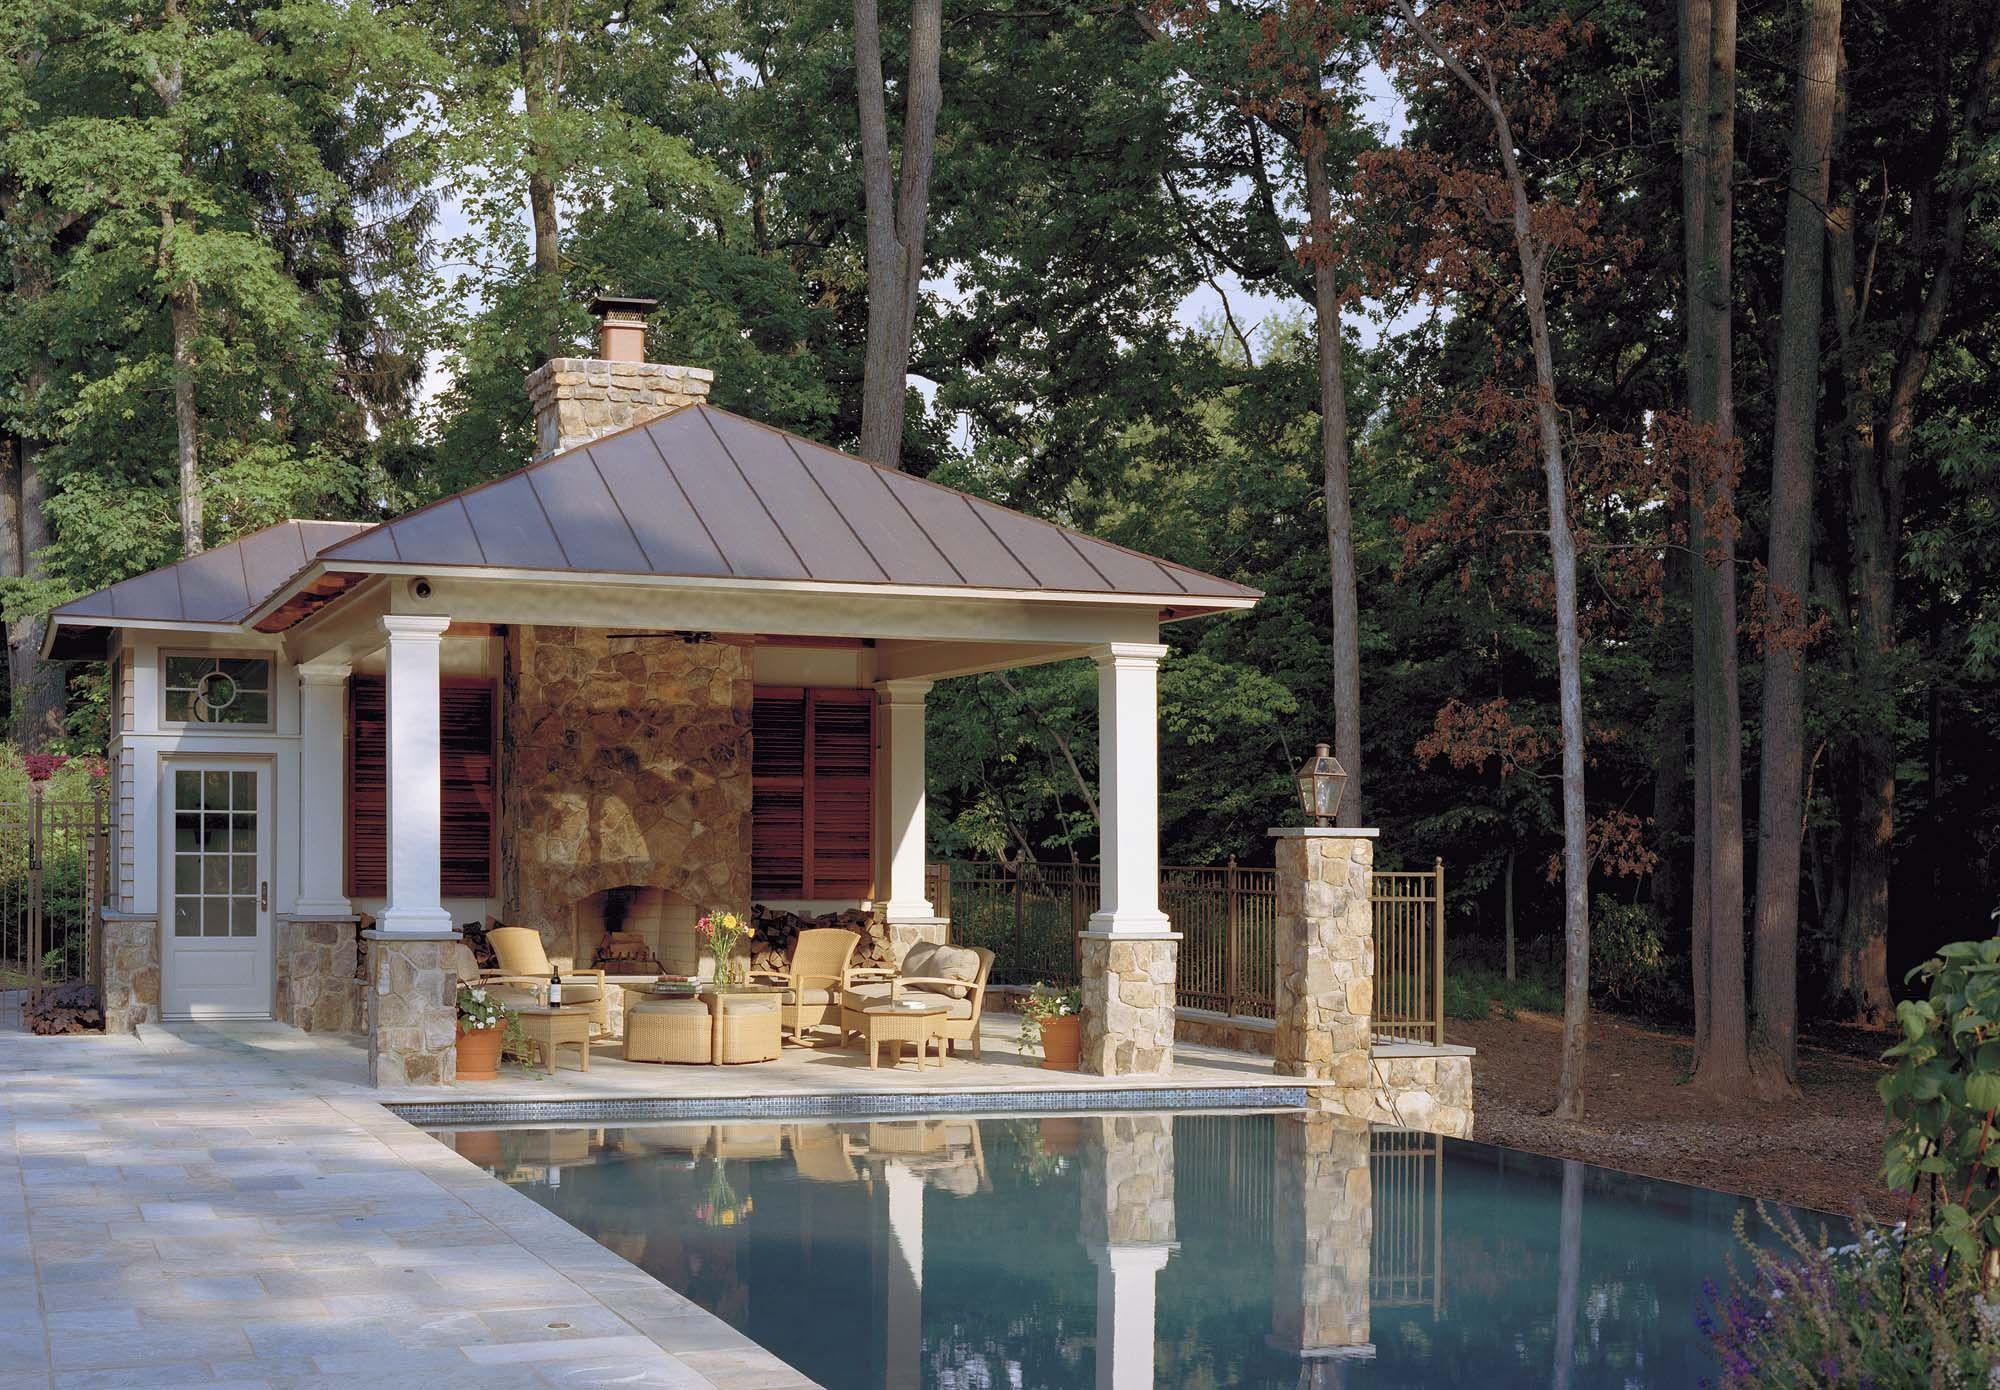 Custom Pool House Wth Bathroom And Kitchen Pool Houses Pool House Bathroom Pool Cabana